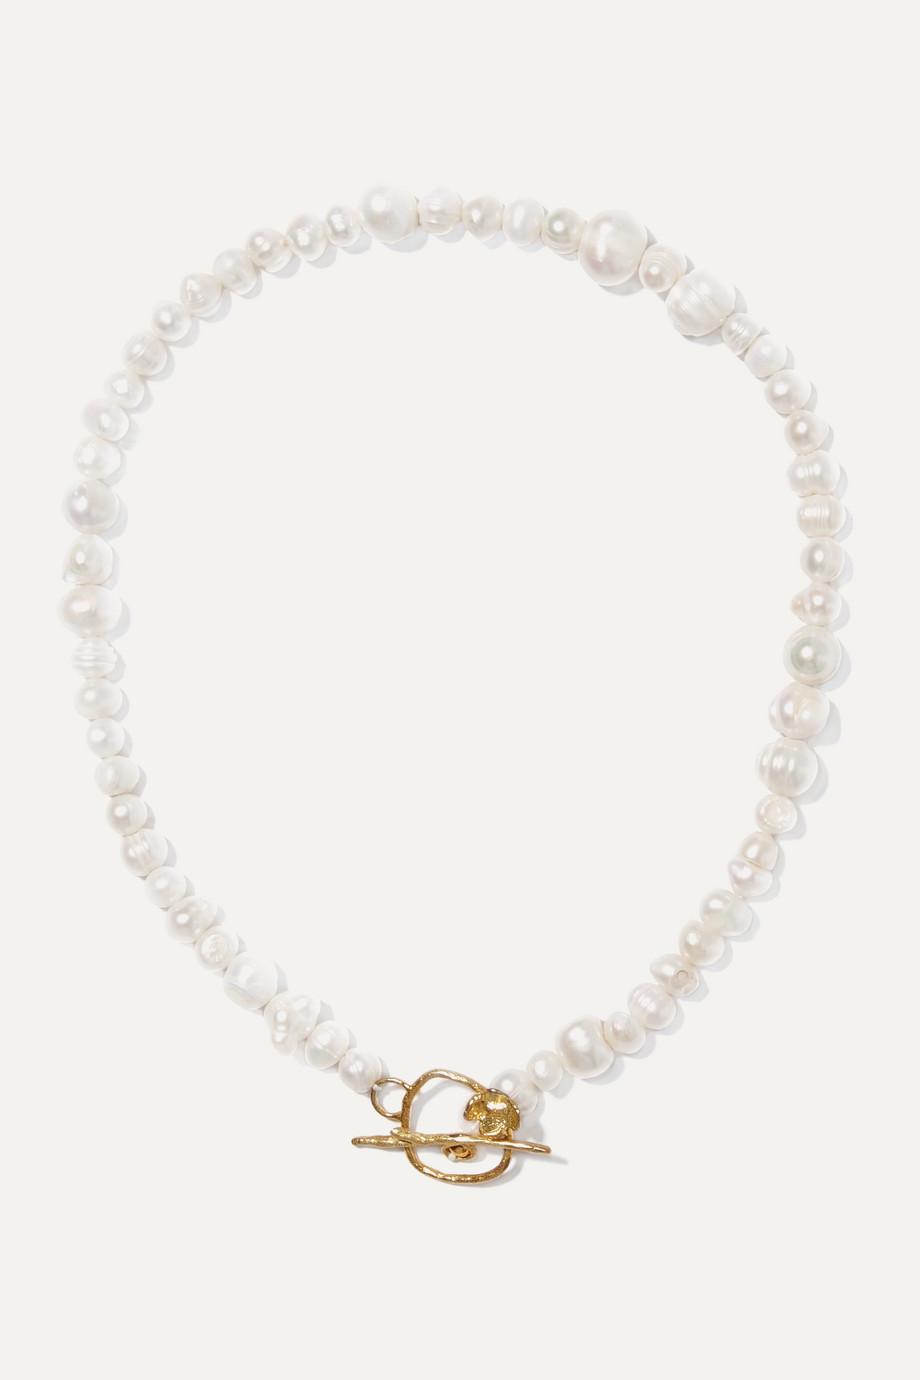 Anita Berisha Magnolia gold-tone pearl necklace